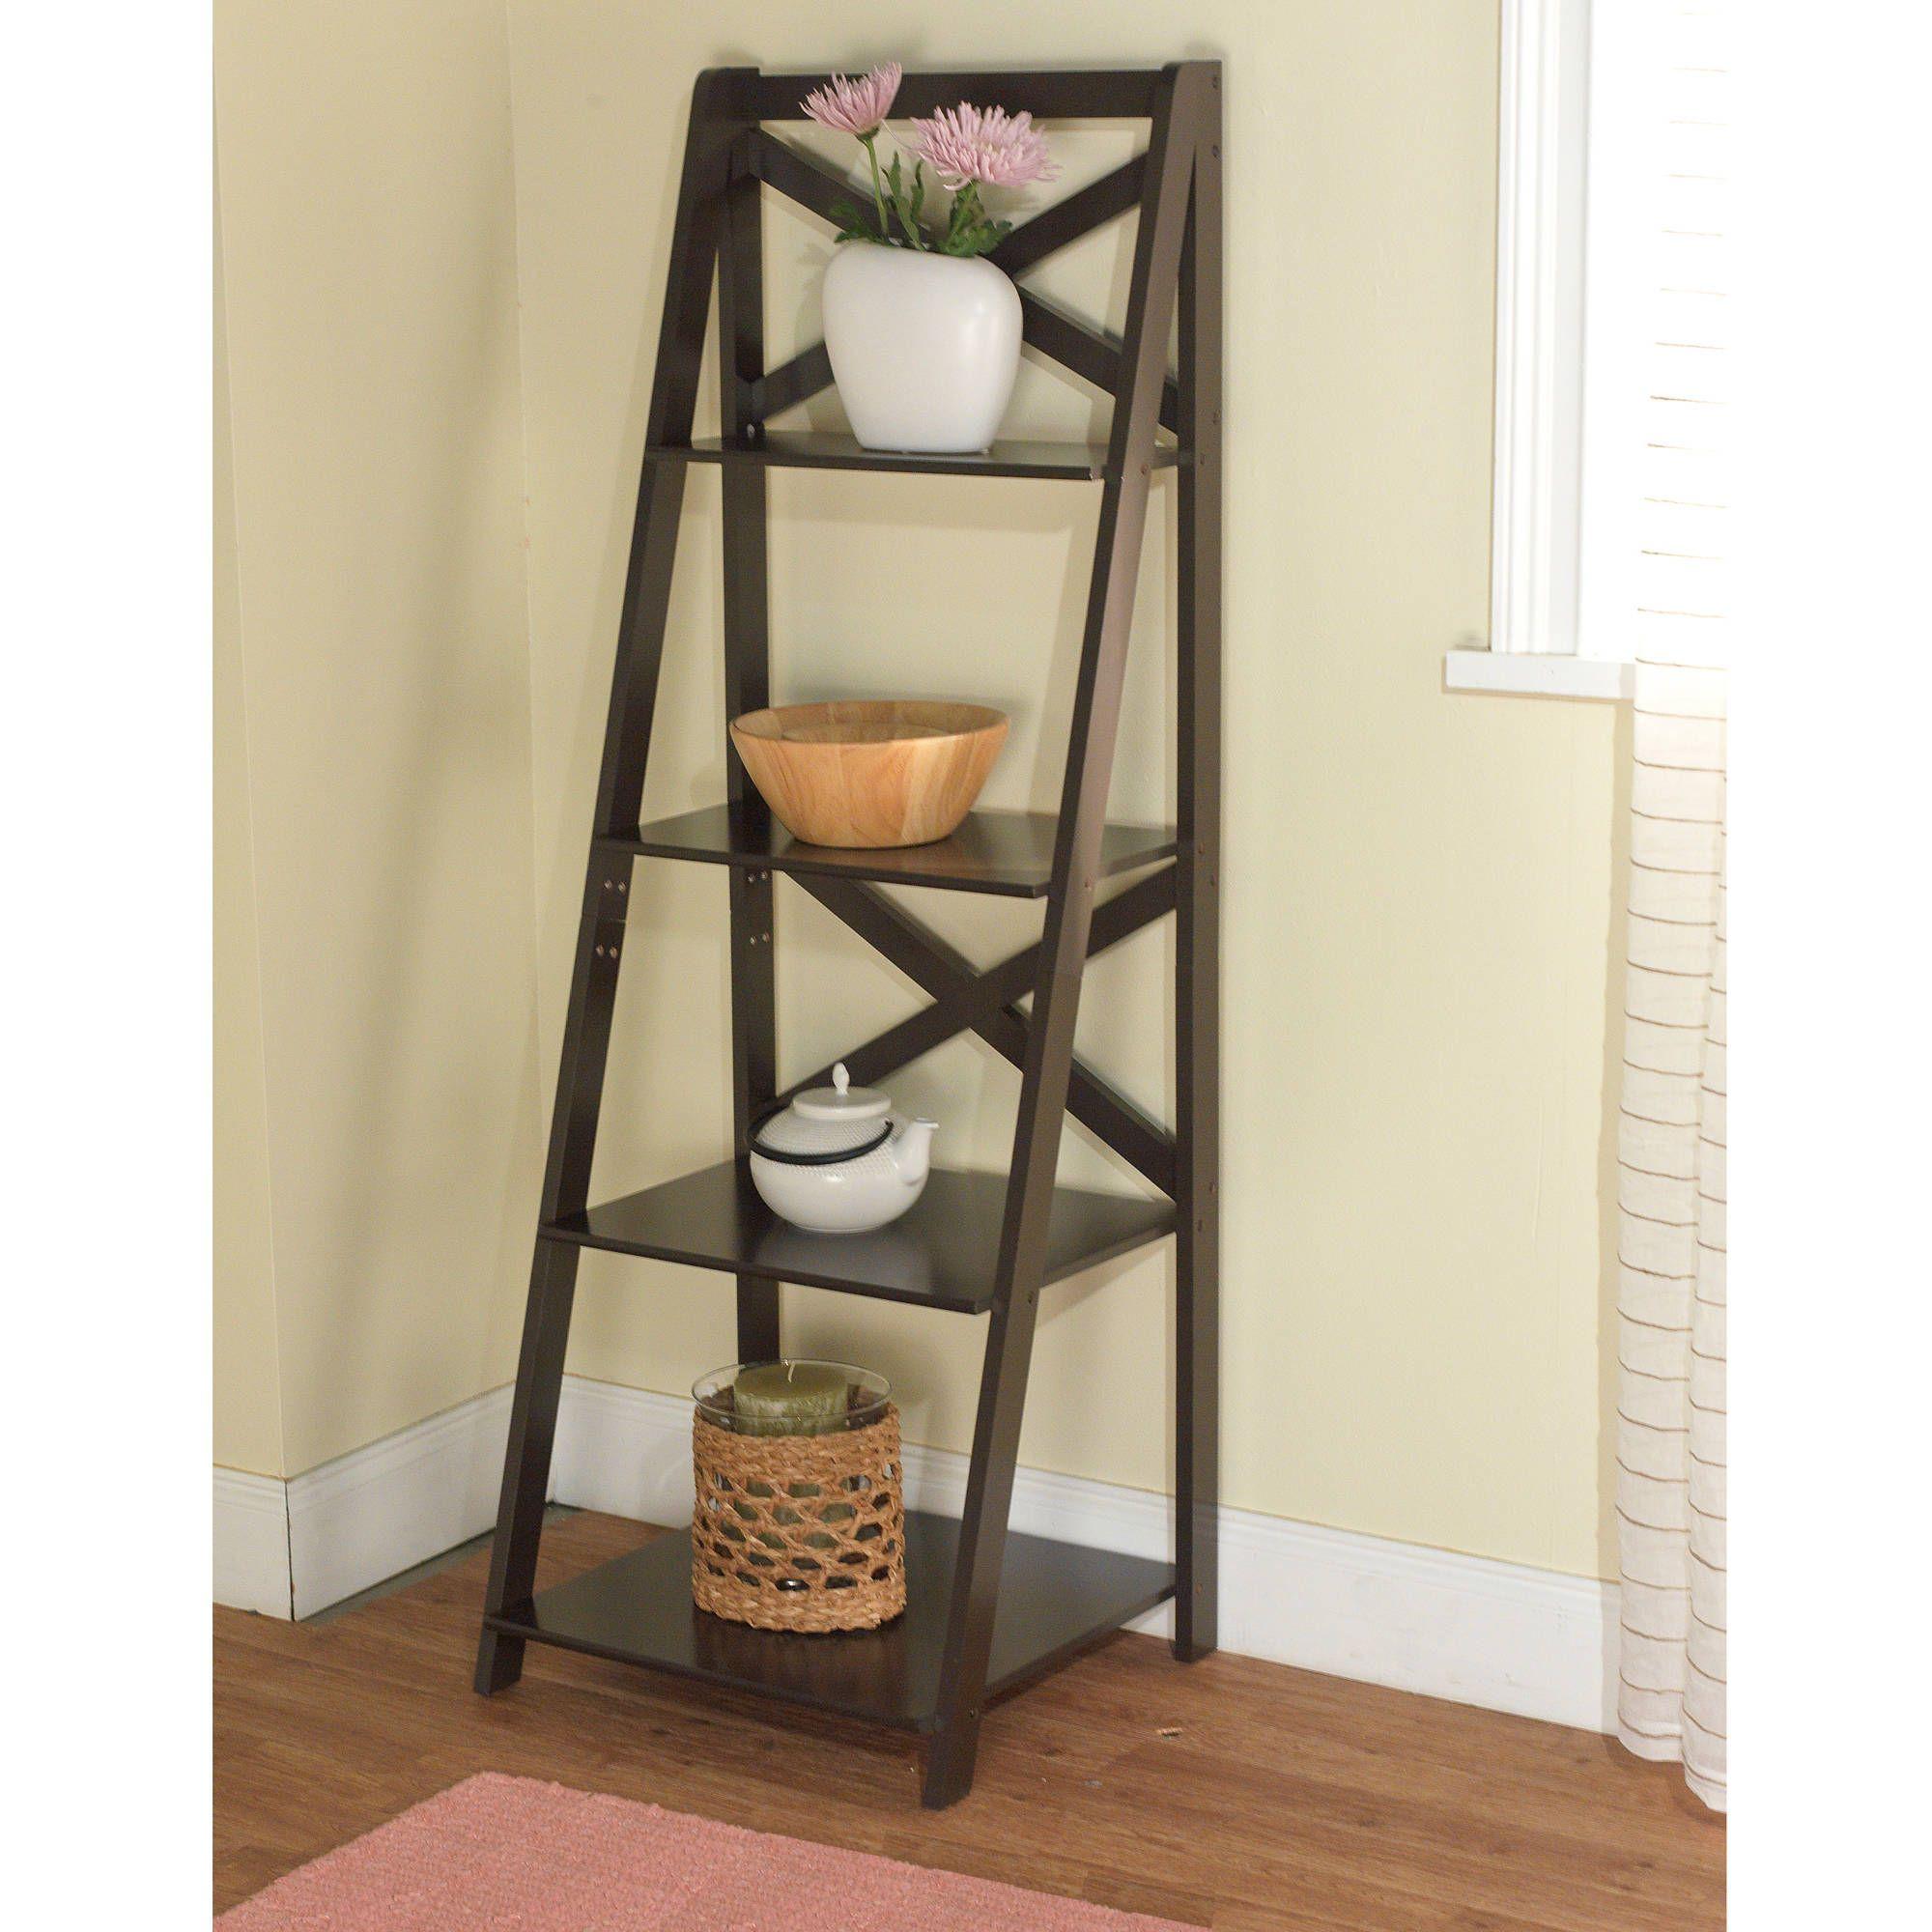 Mainstays Leaning Ladder 5 Shelf Bookcase Espresso